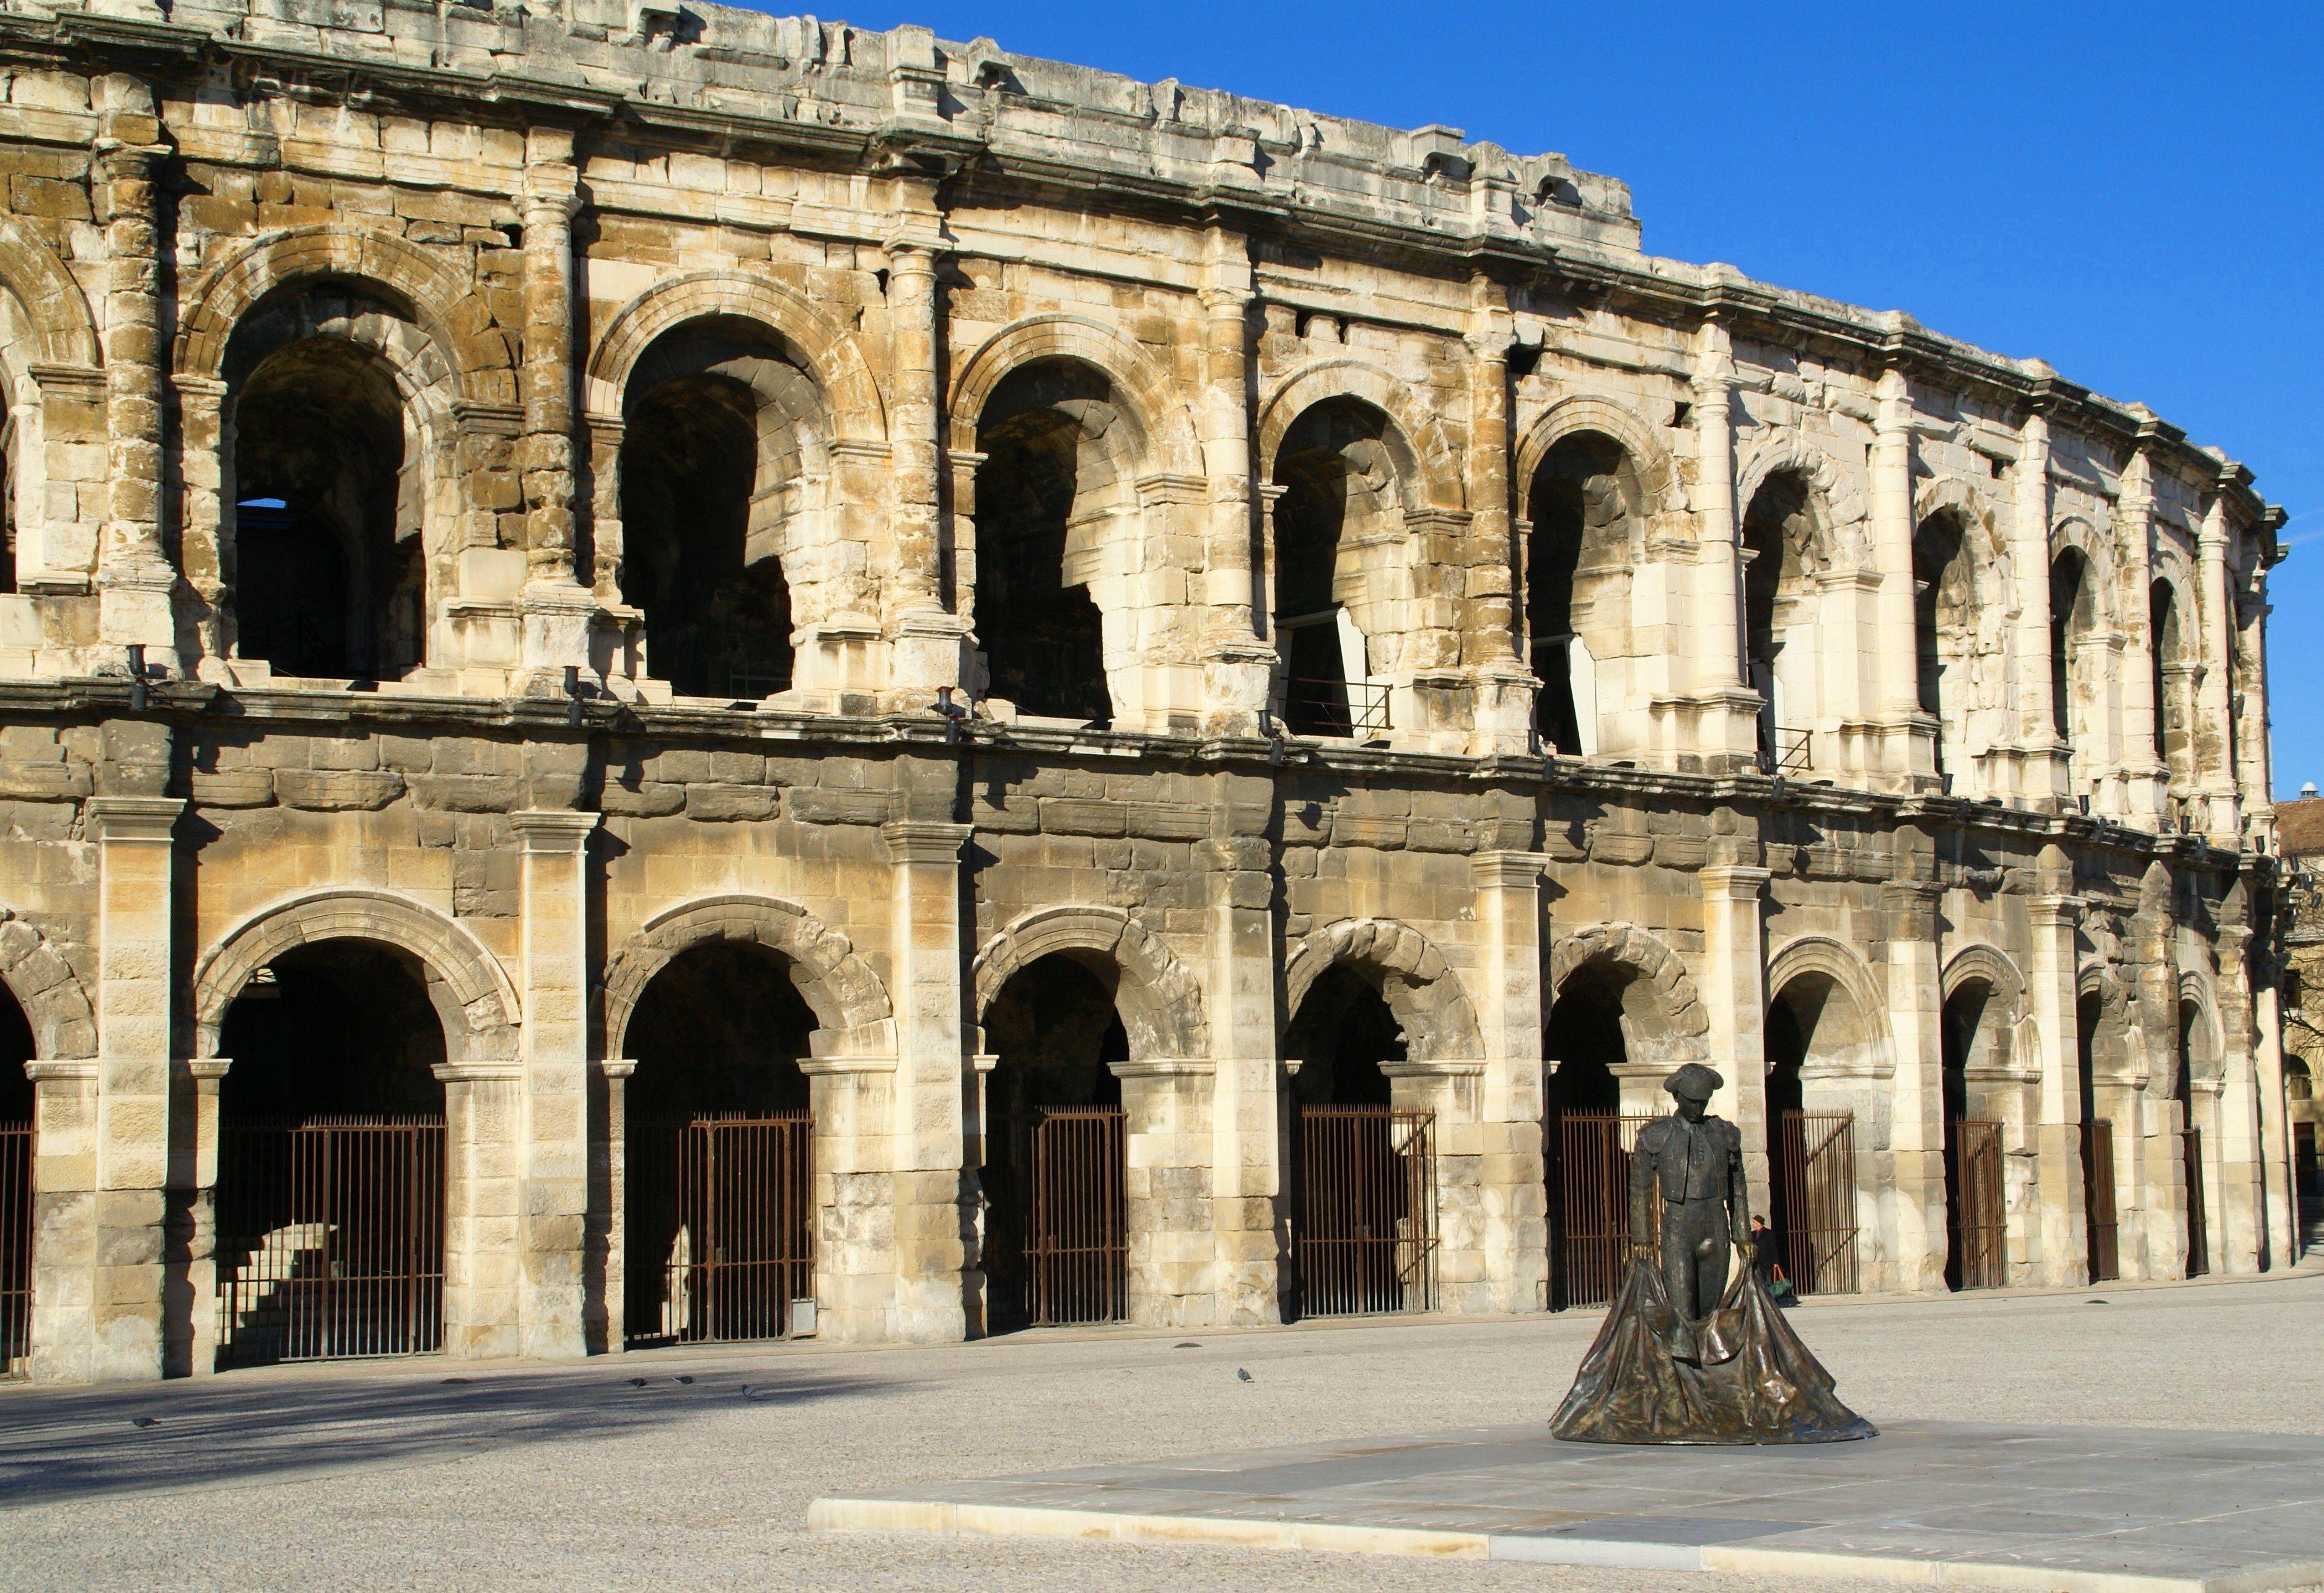 The Roman Arena at Nimes